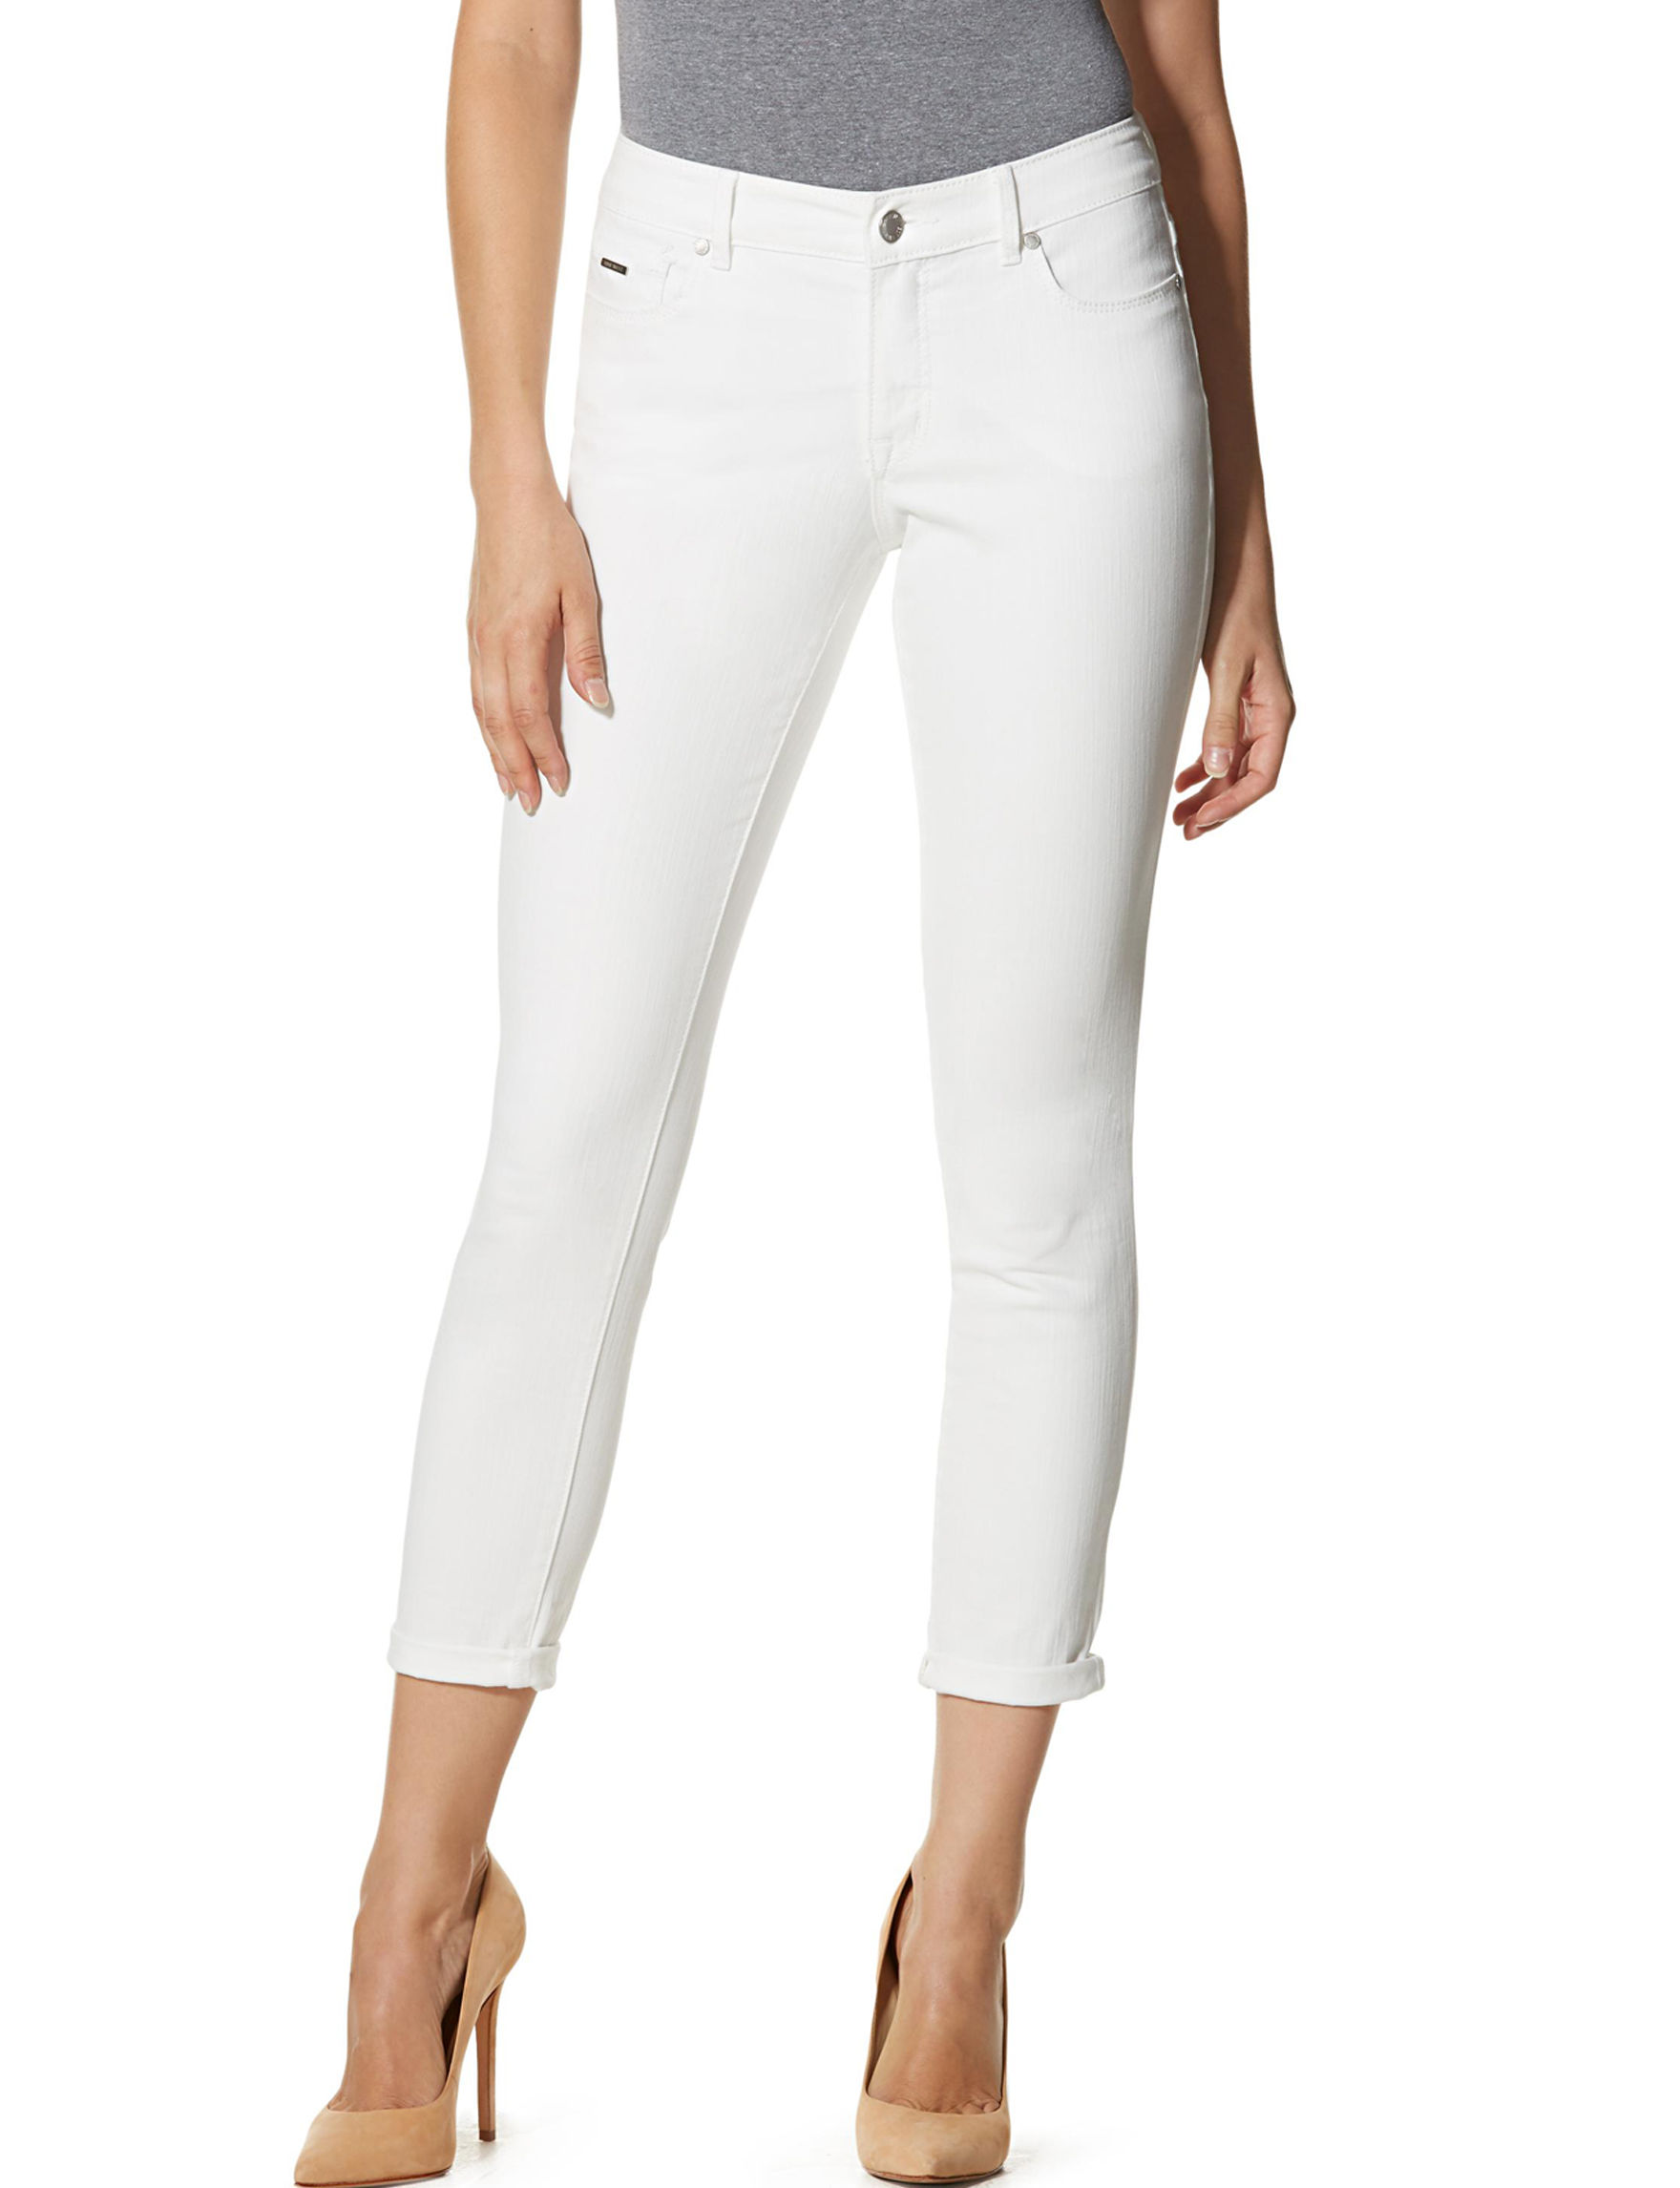 Nine West Jeans White Skinny